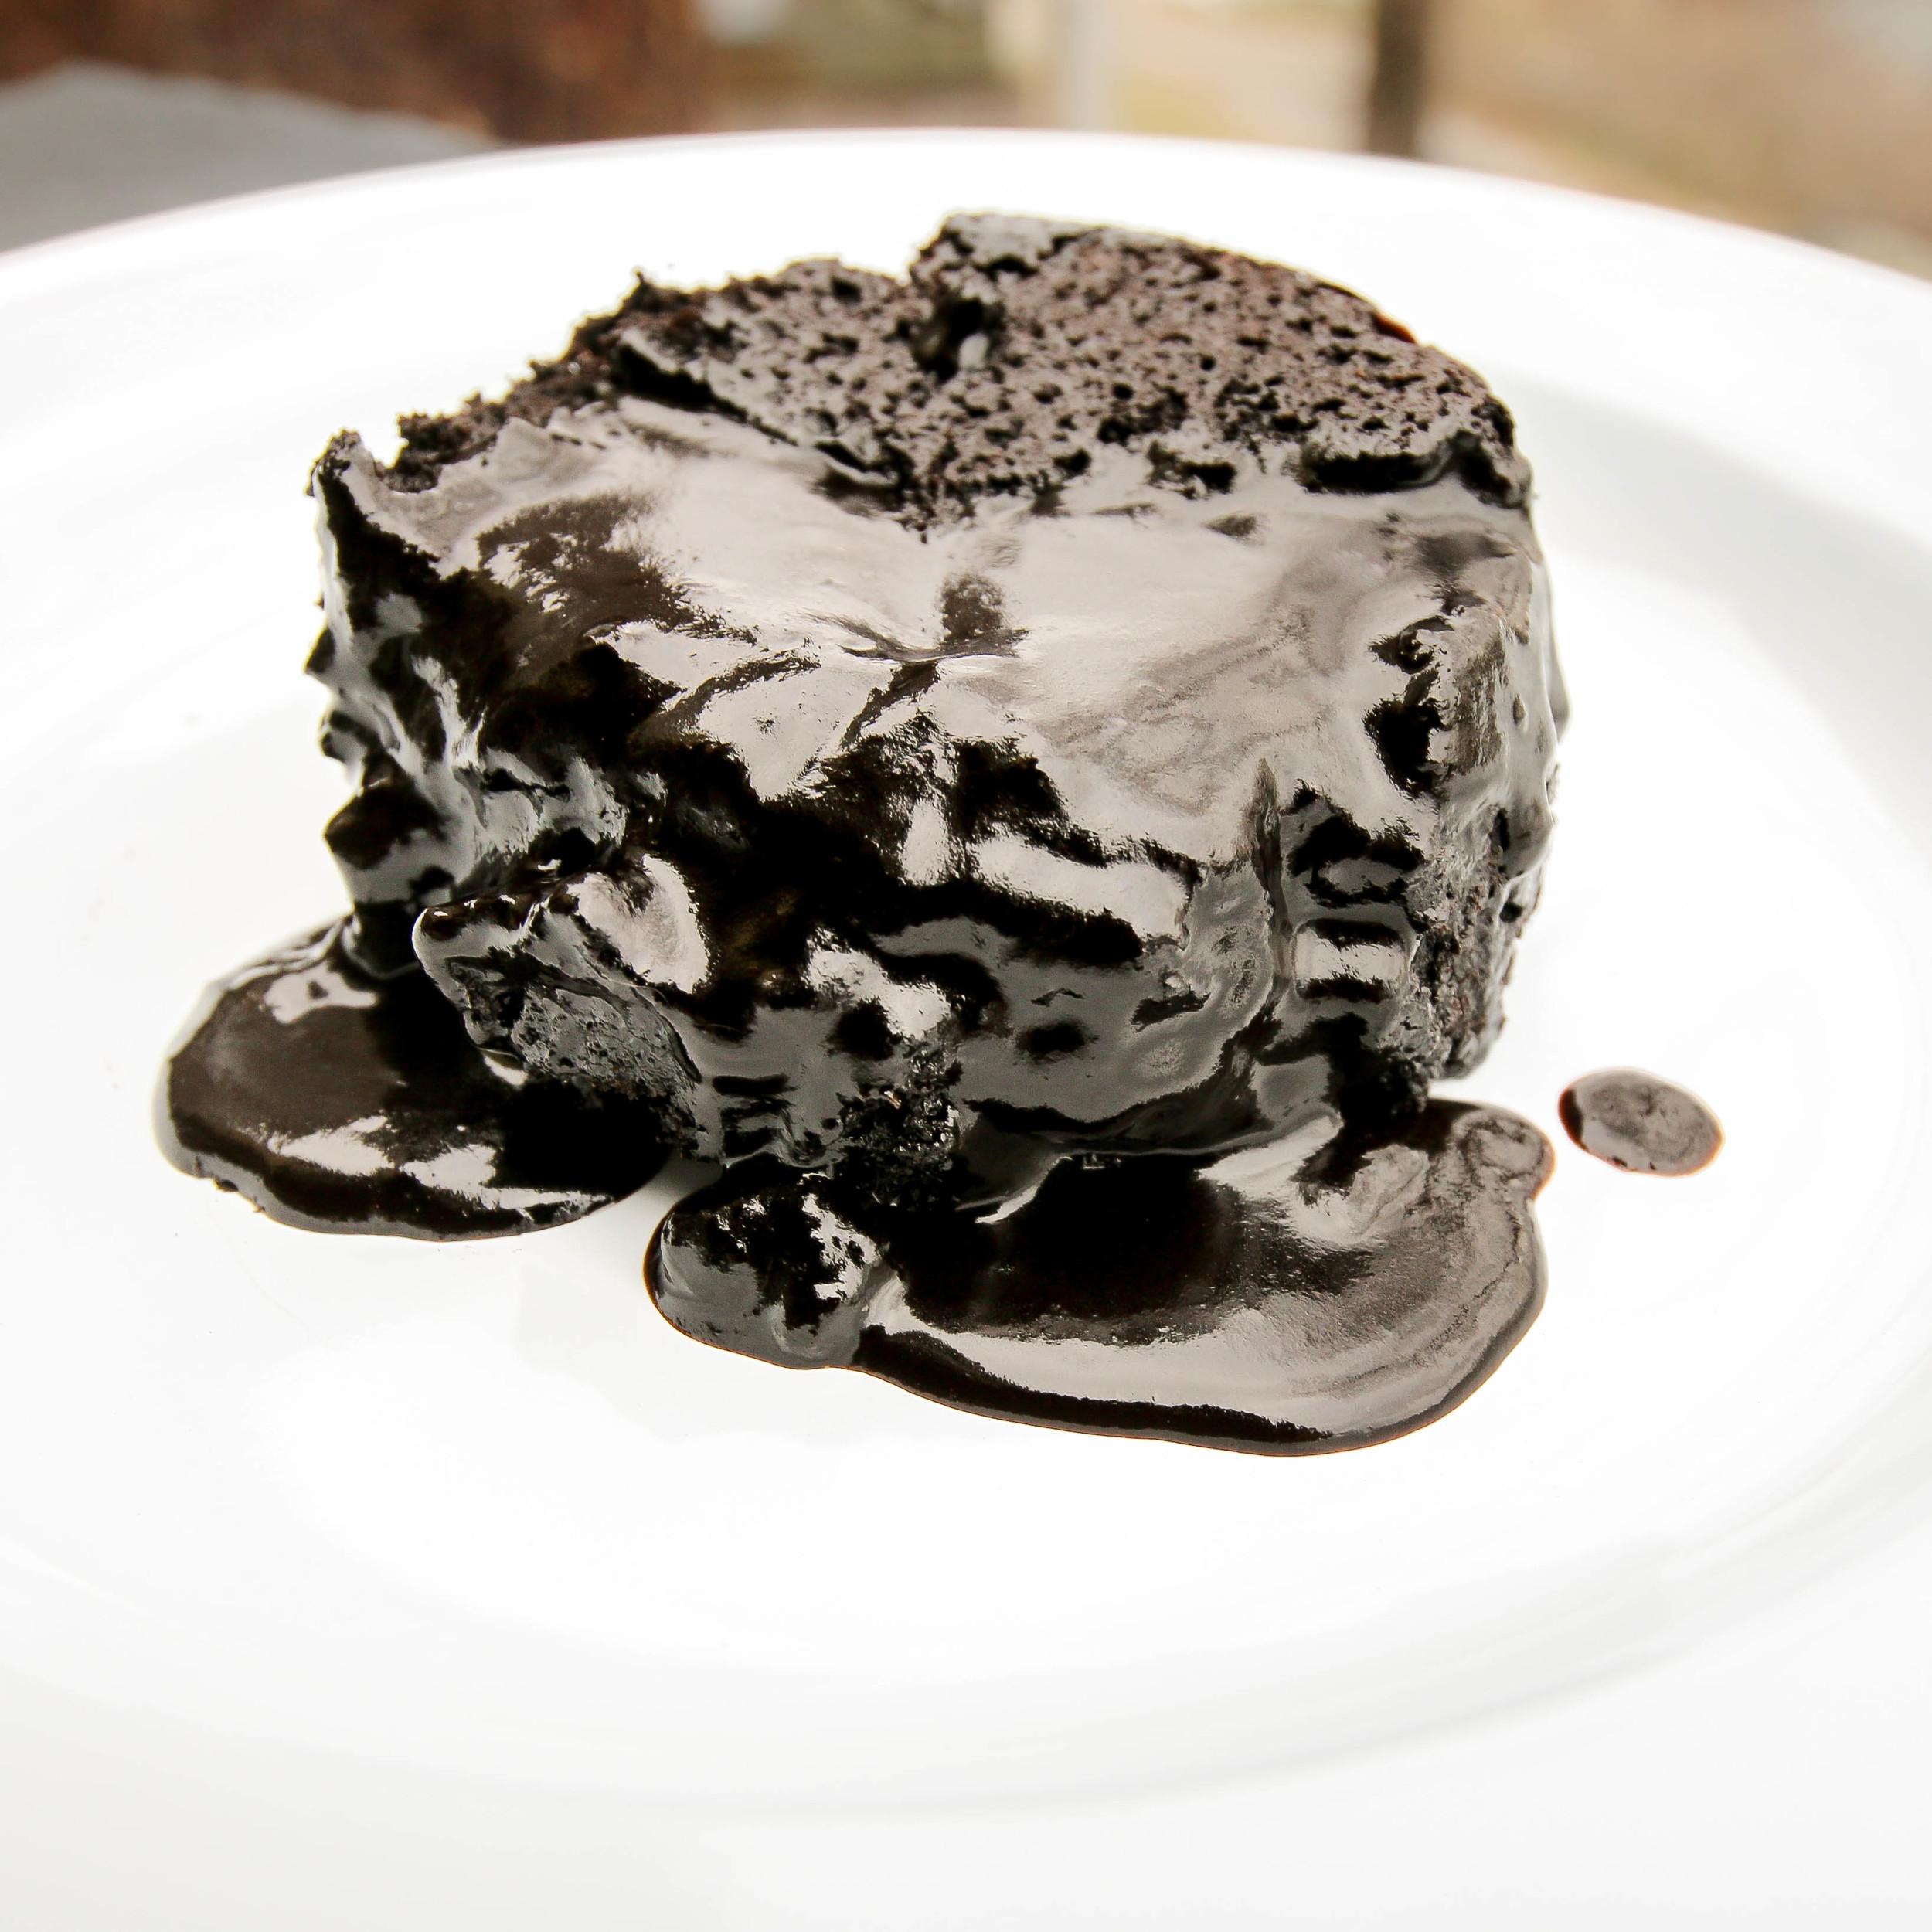 Black Fudge Pudding Cake.jpeg